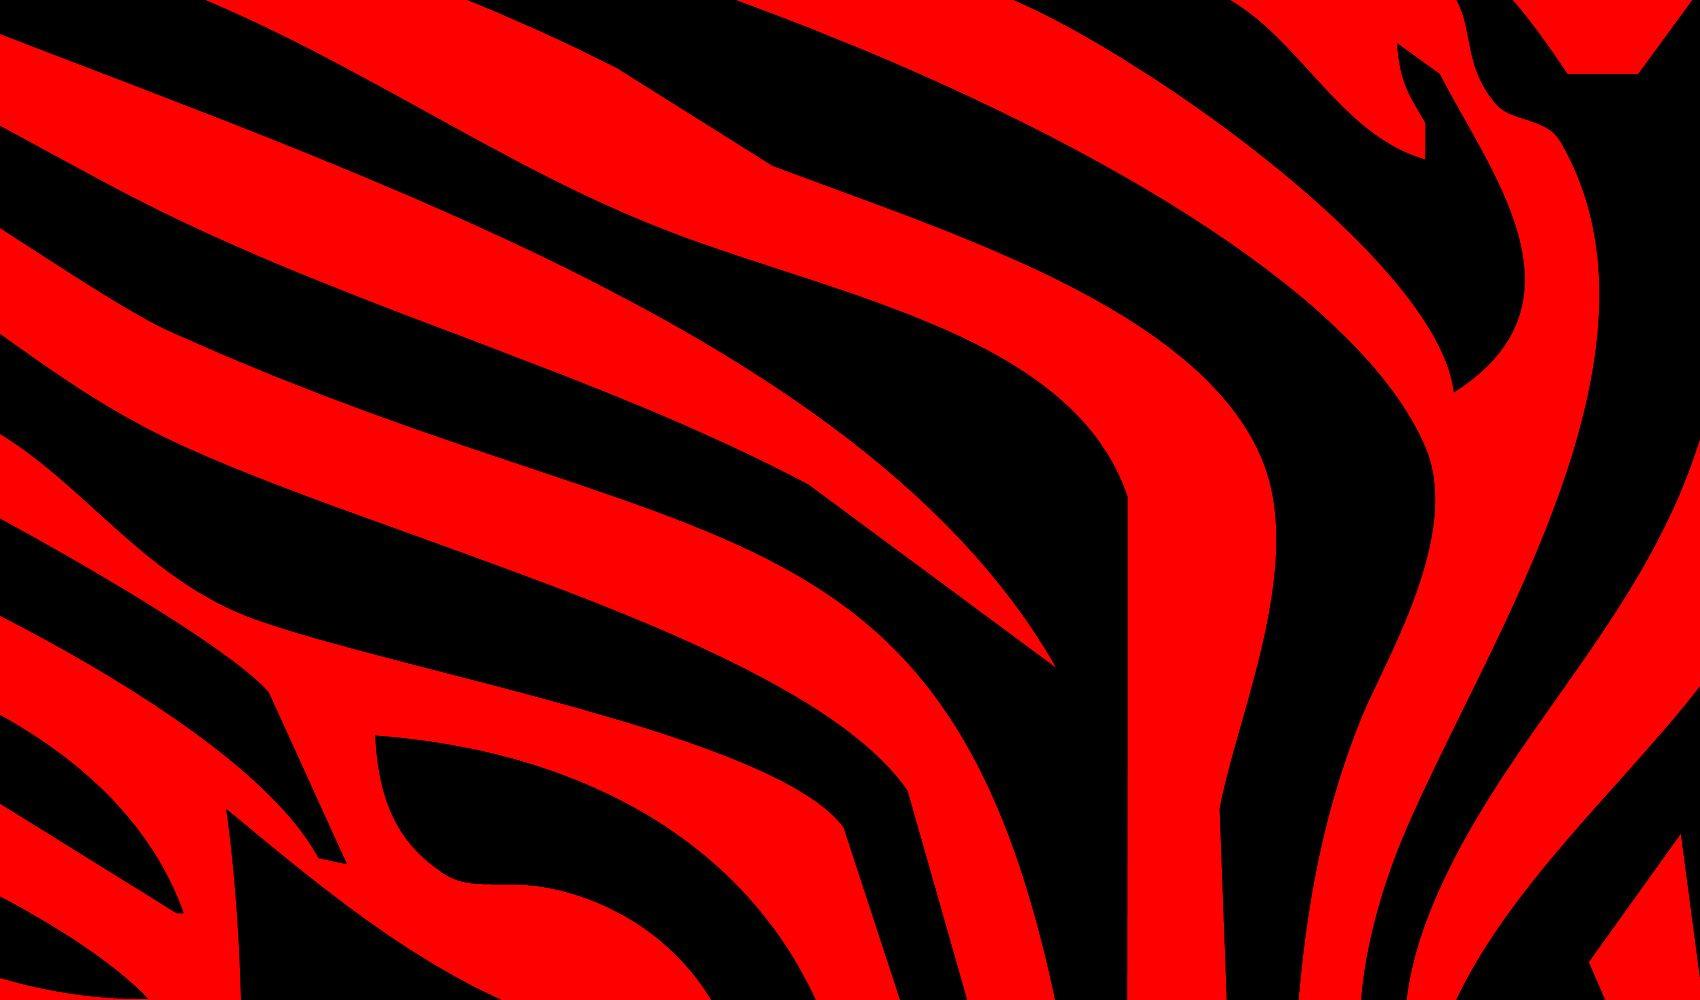 Red And Black Stripes Animal Print Wallpaper Zebra Print